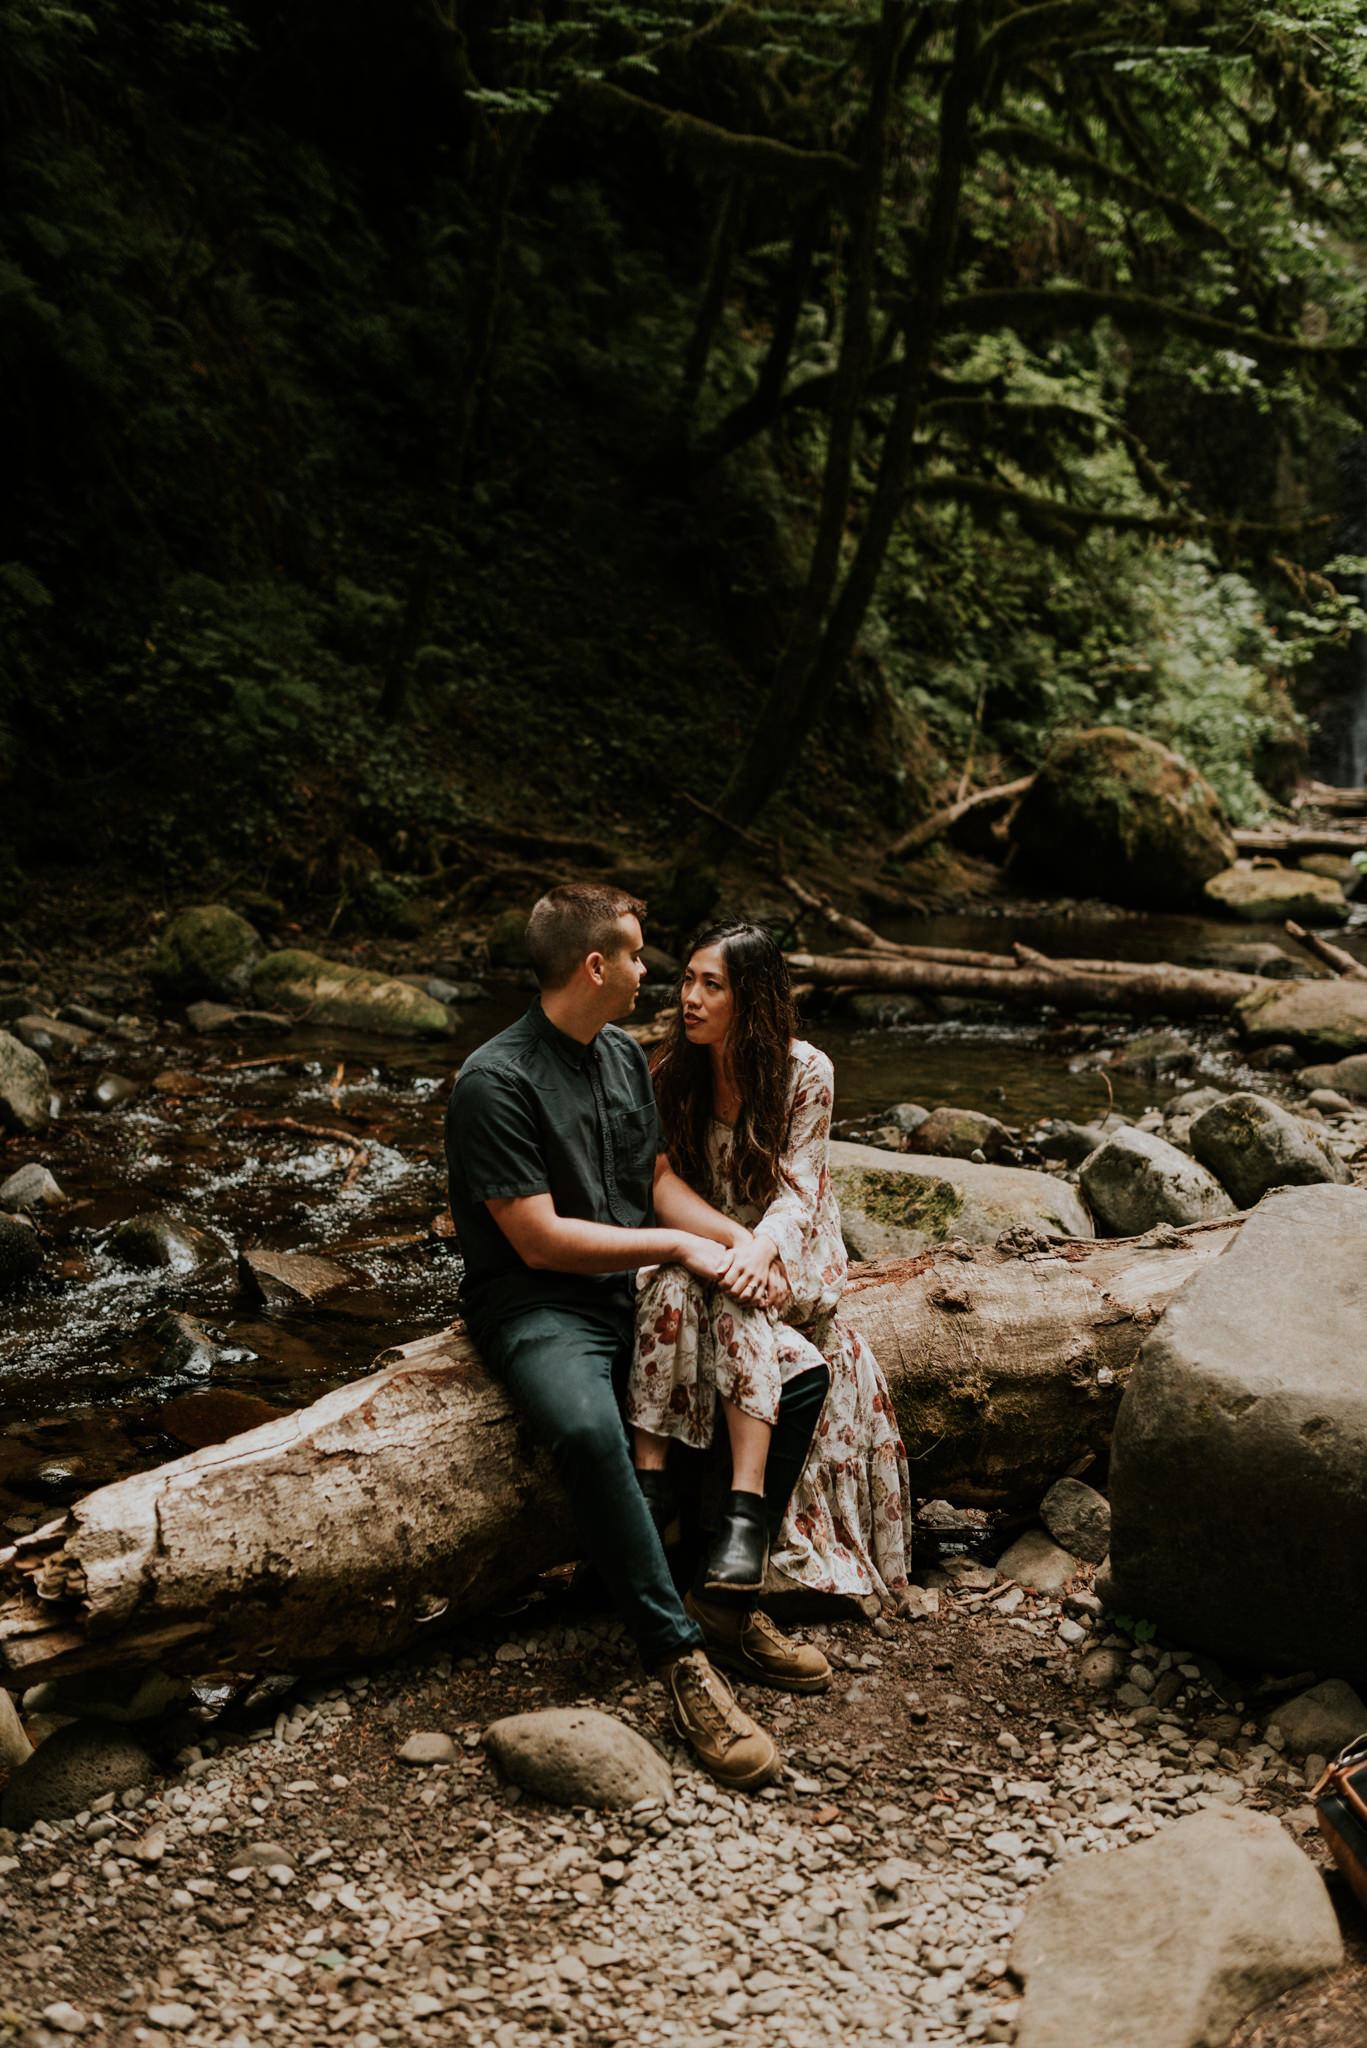 adventurous-greenery-waterfall-intimate-boho-engagement-session-at-wiesendanger-falls-on-the-columbia-river-gorge-portland-oregon-wedding-photographer